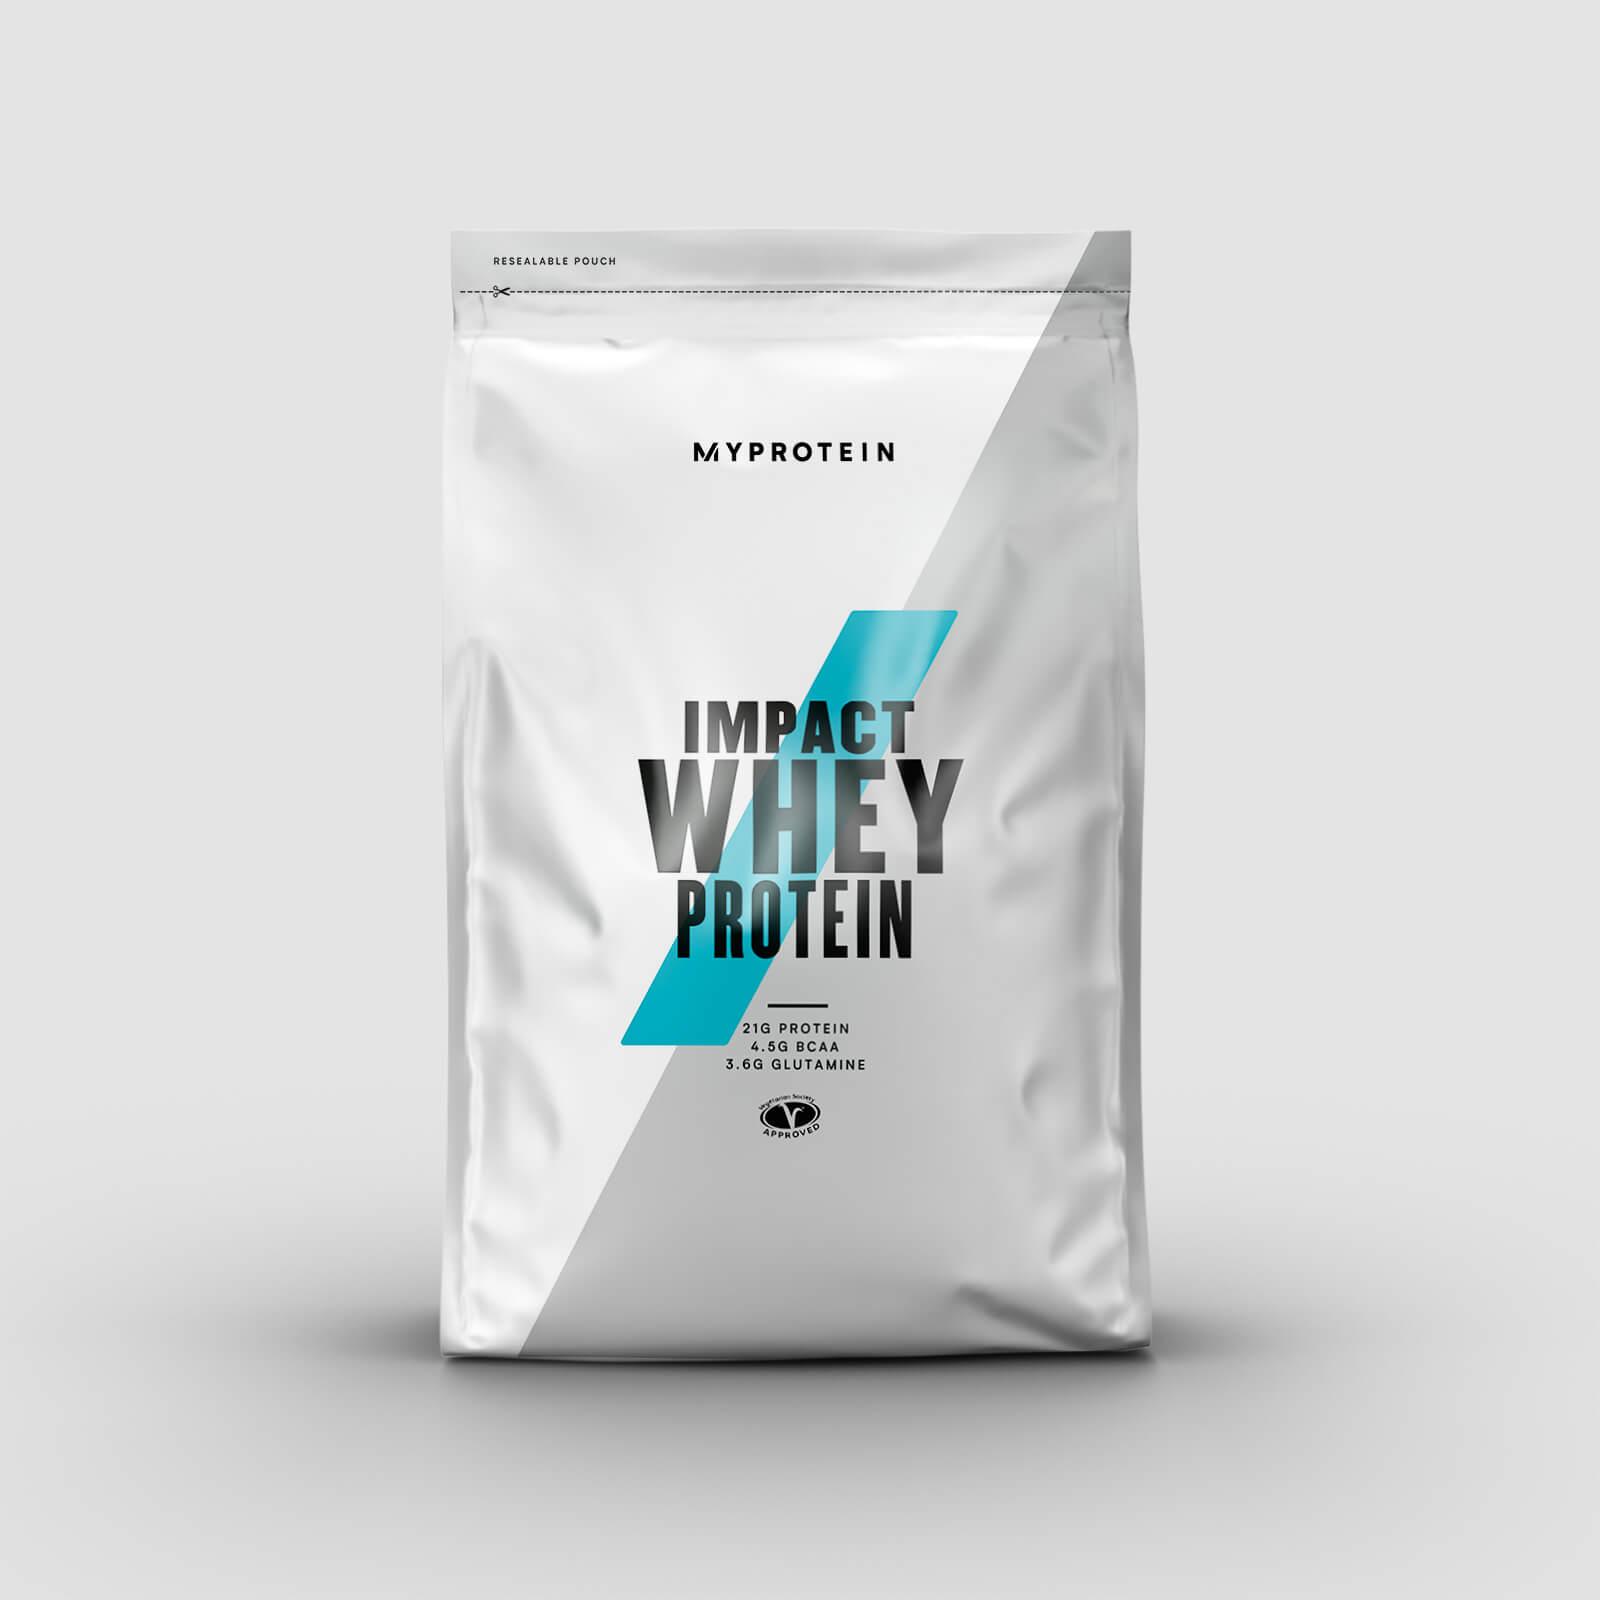 Myprotein Vassleprotein - Impact Whey Protein - 1kg - Cookies and Cream